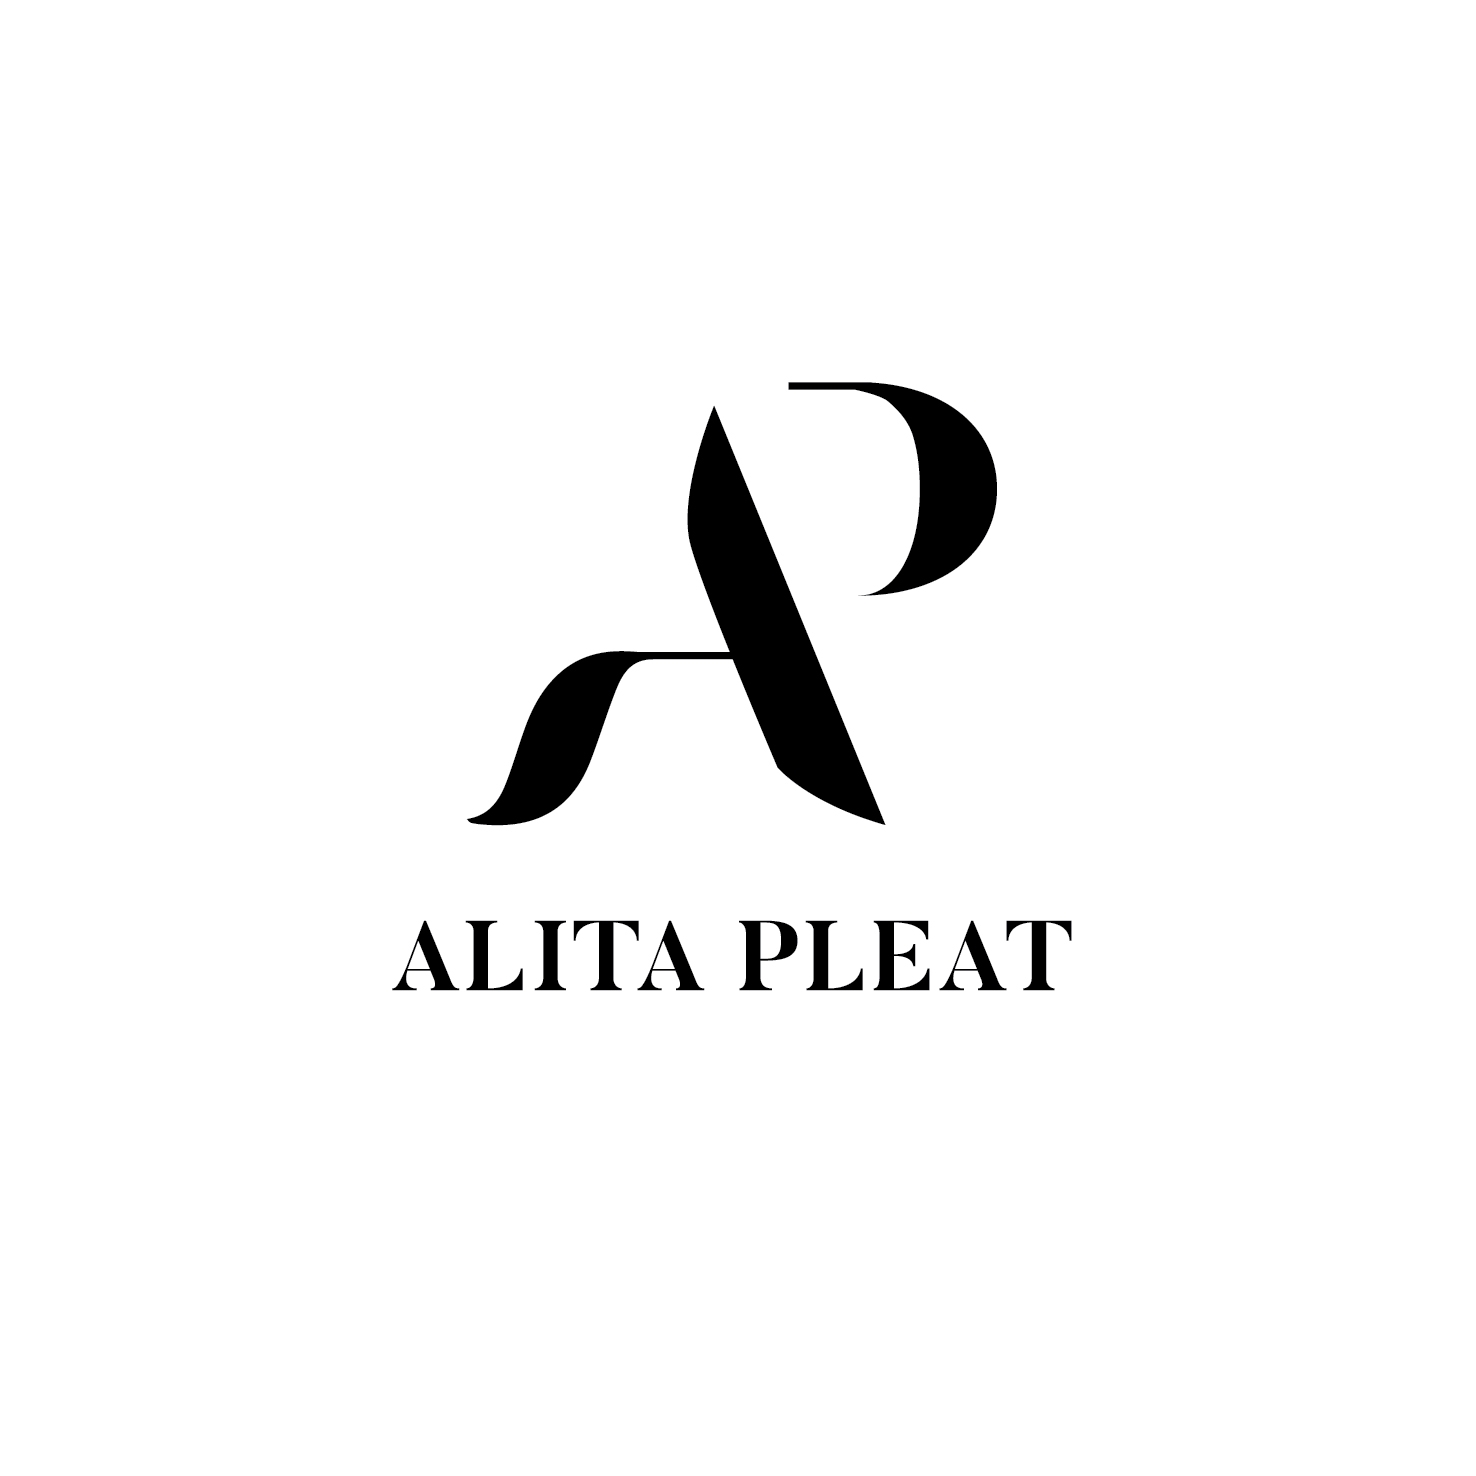 Alita Pleat